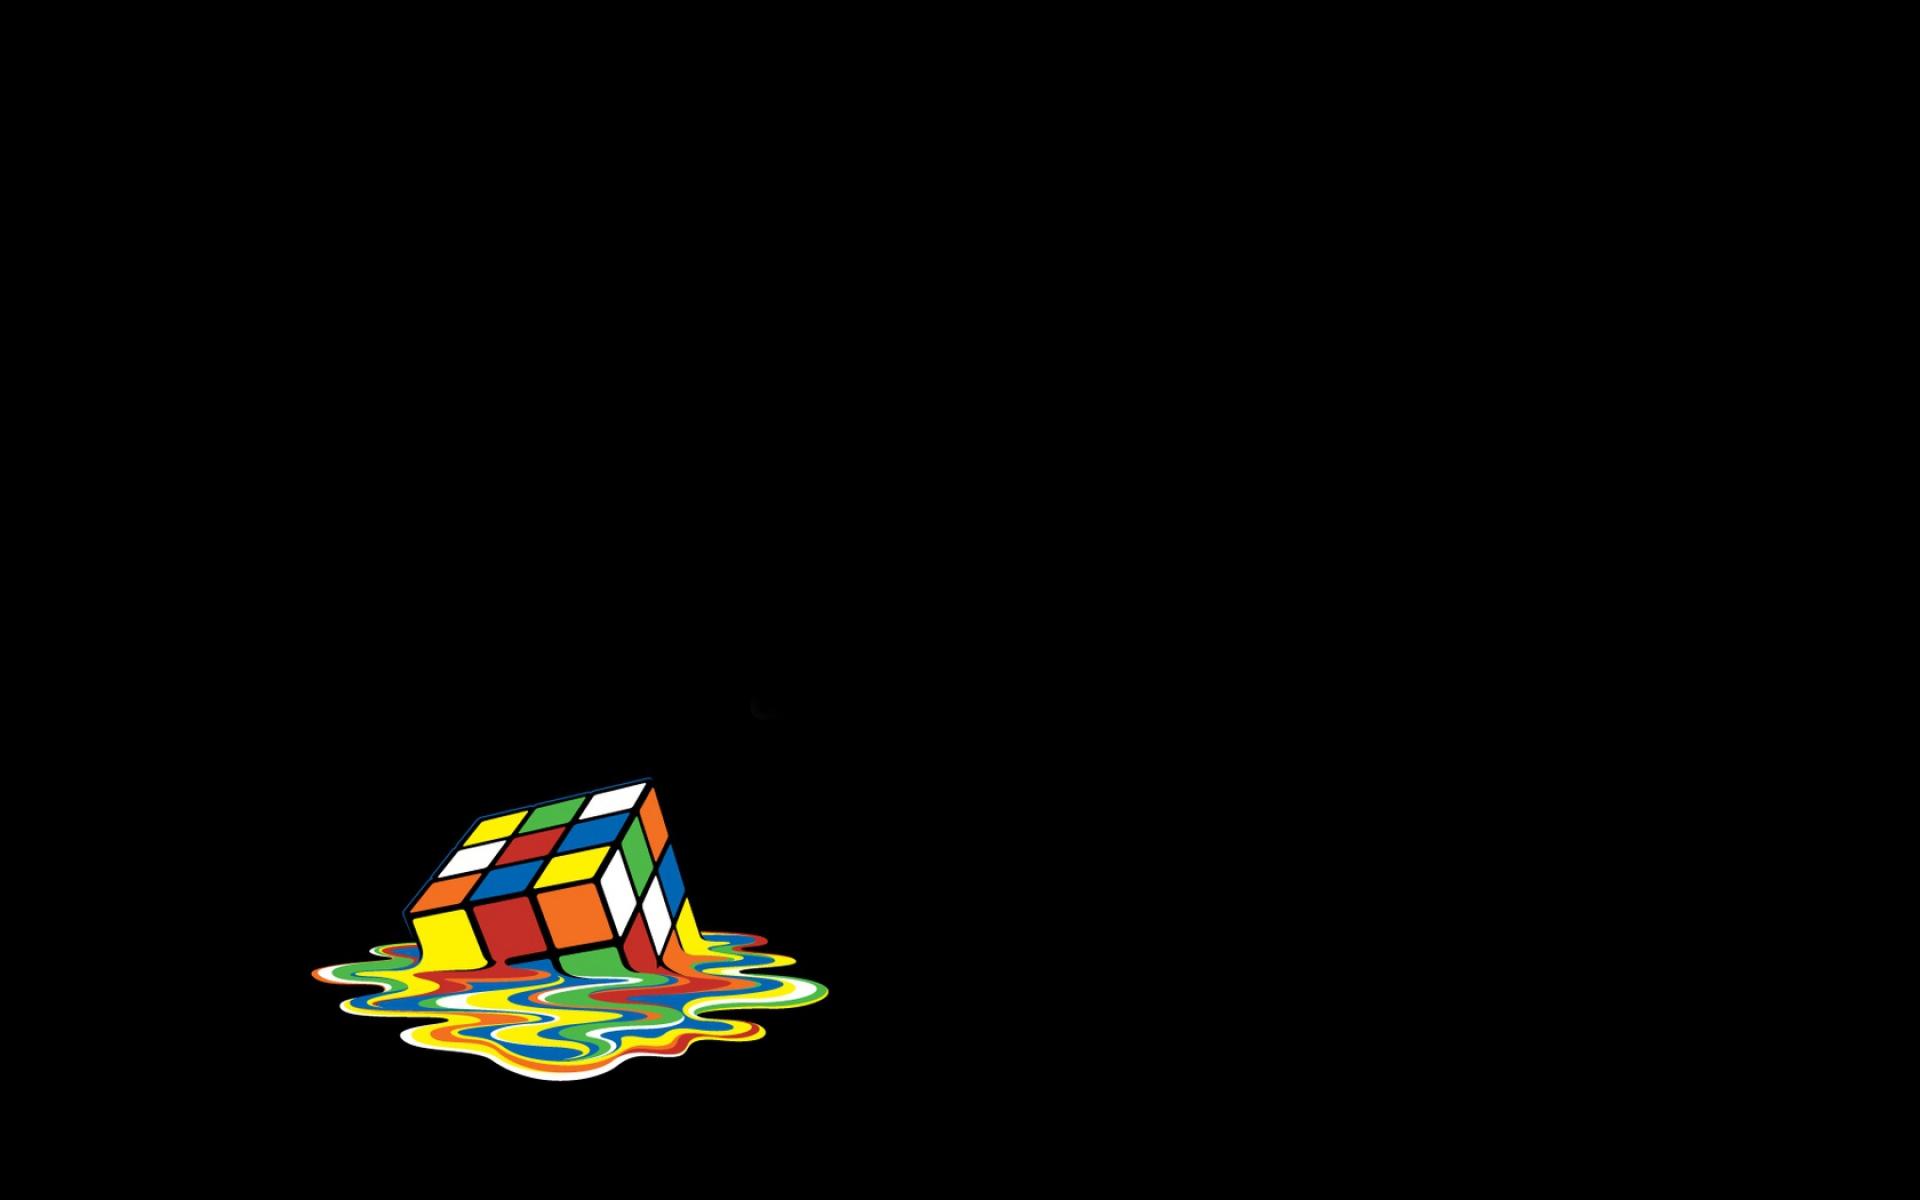 Rubik Cube Schmelzen Vektor Hintergrundbilder Rubik Cube Schmelzen 1920x1200